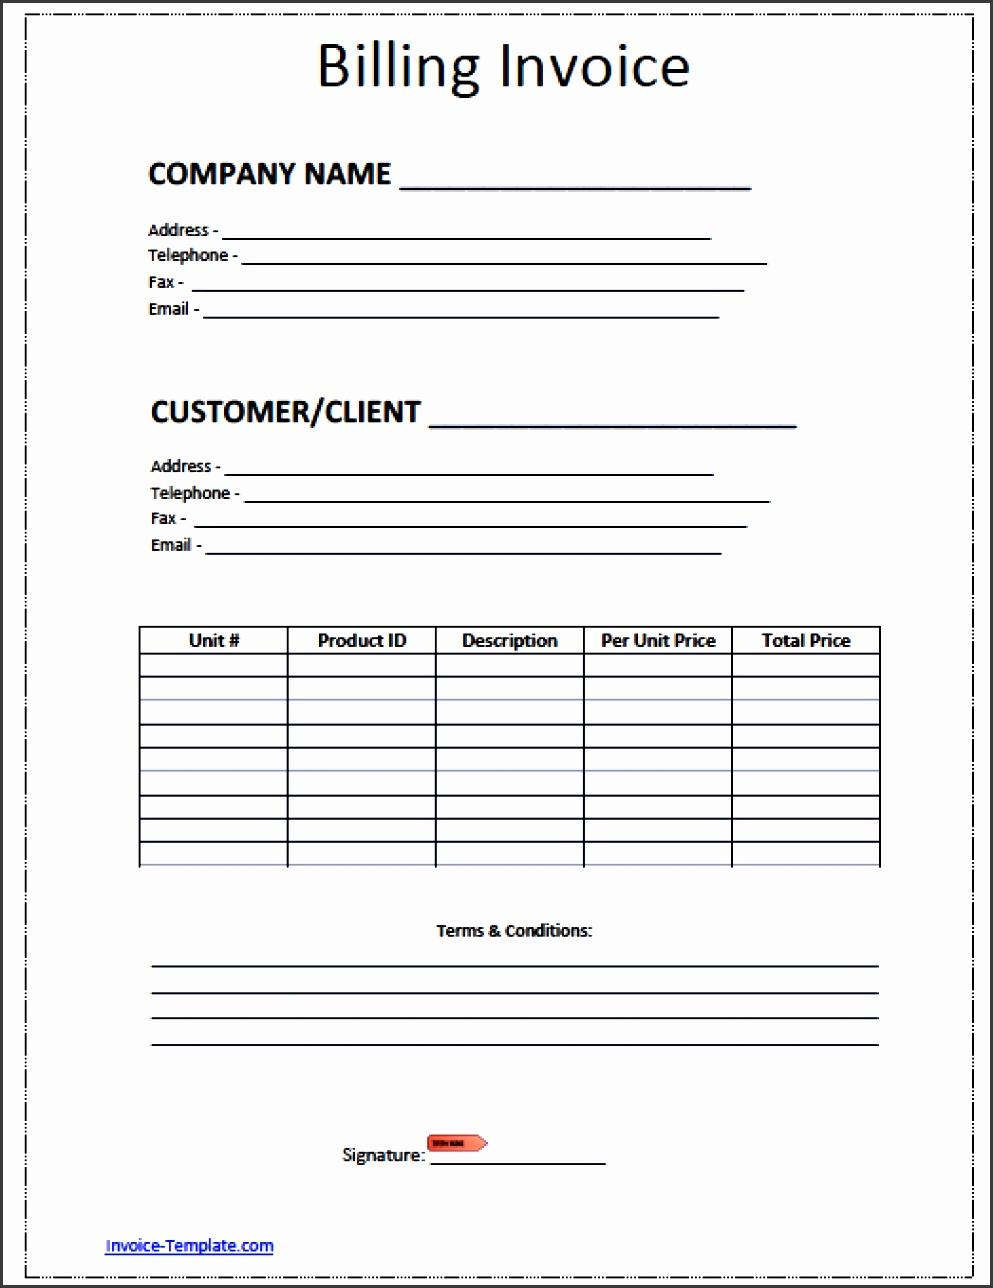 billing invoice template word pdf